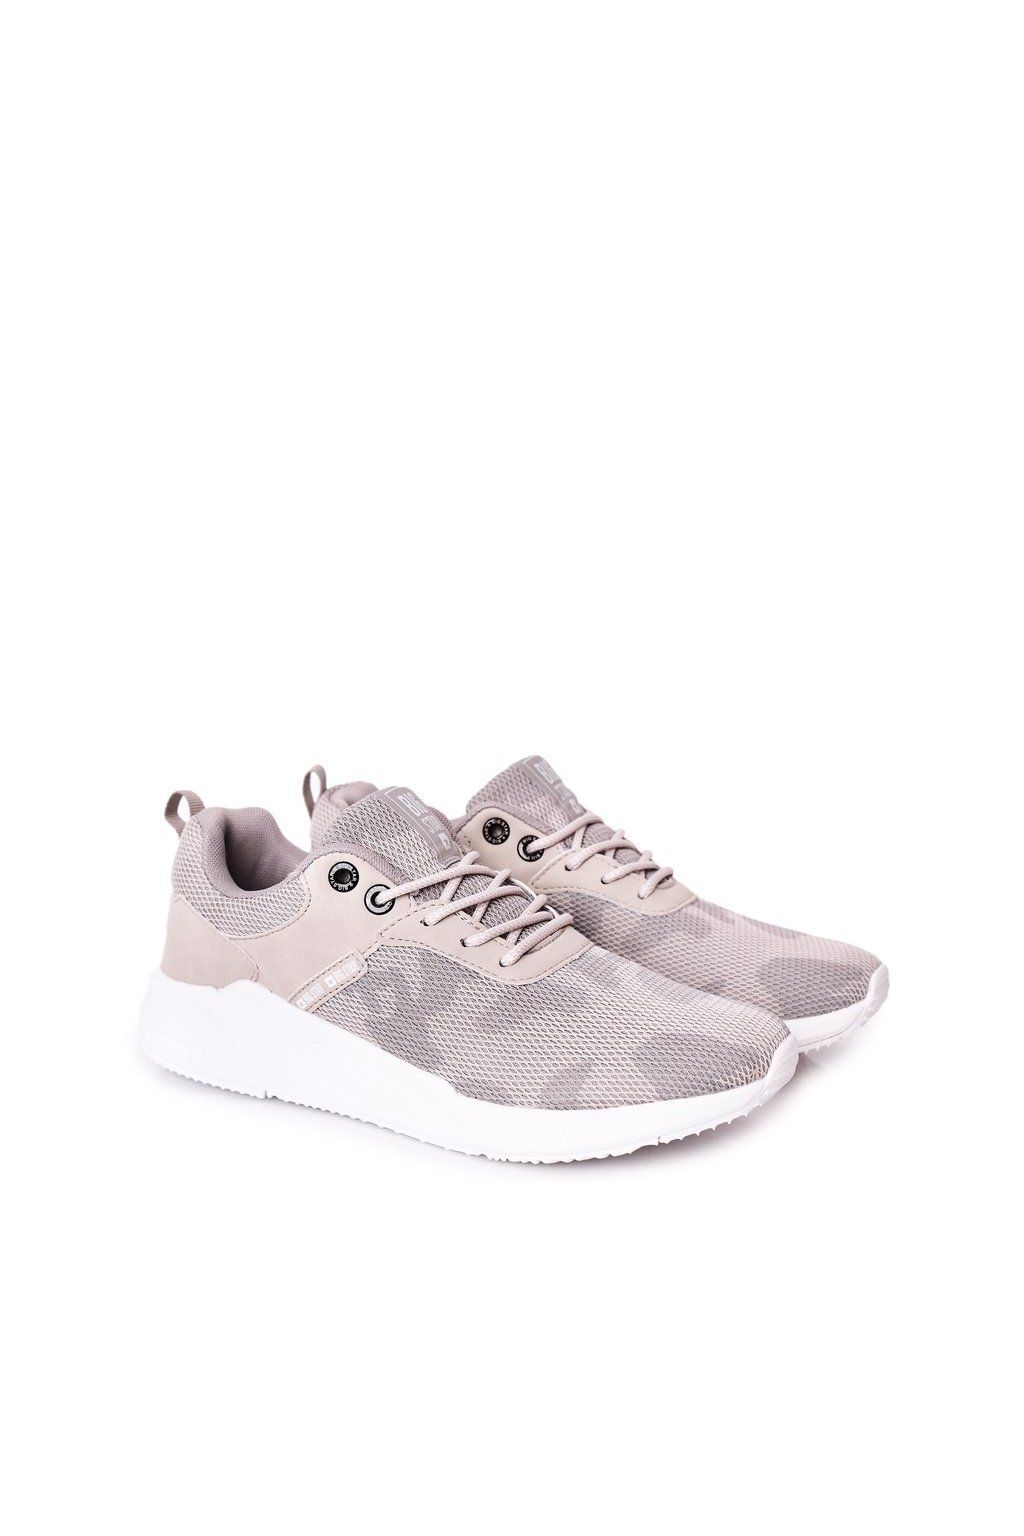 Sivá obuv kód topánok HH174139 GREY